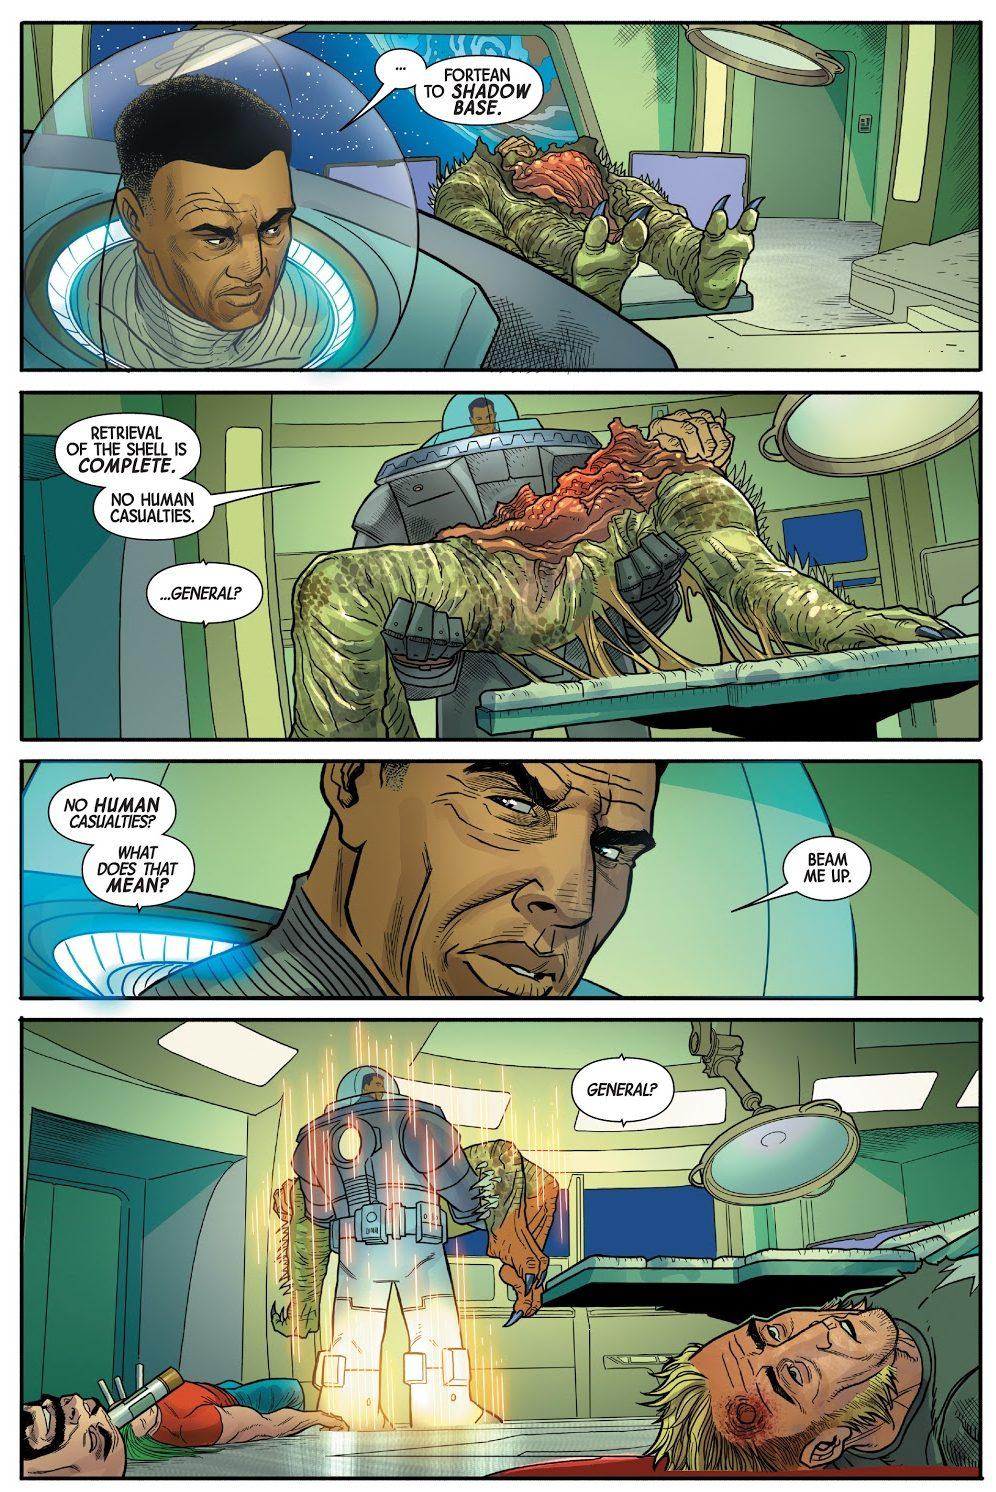 General Fortean Kills Gamma Flight